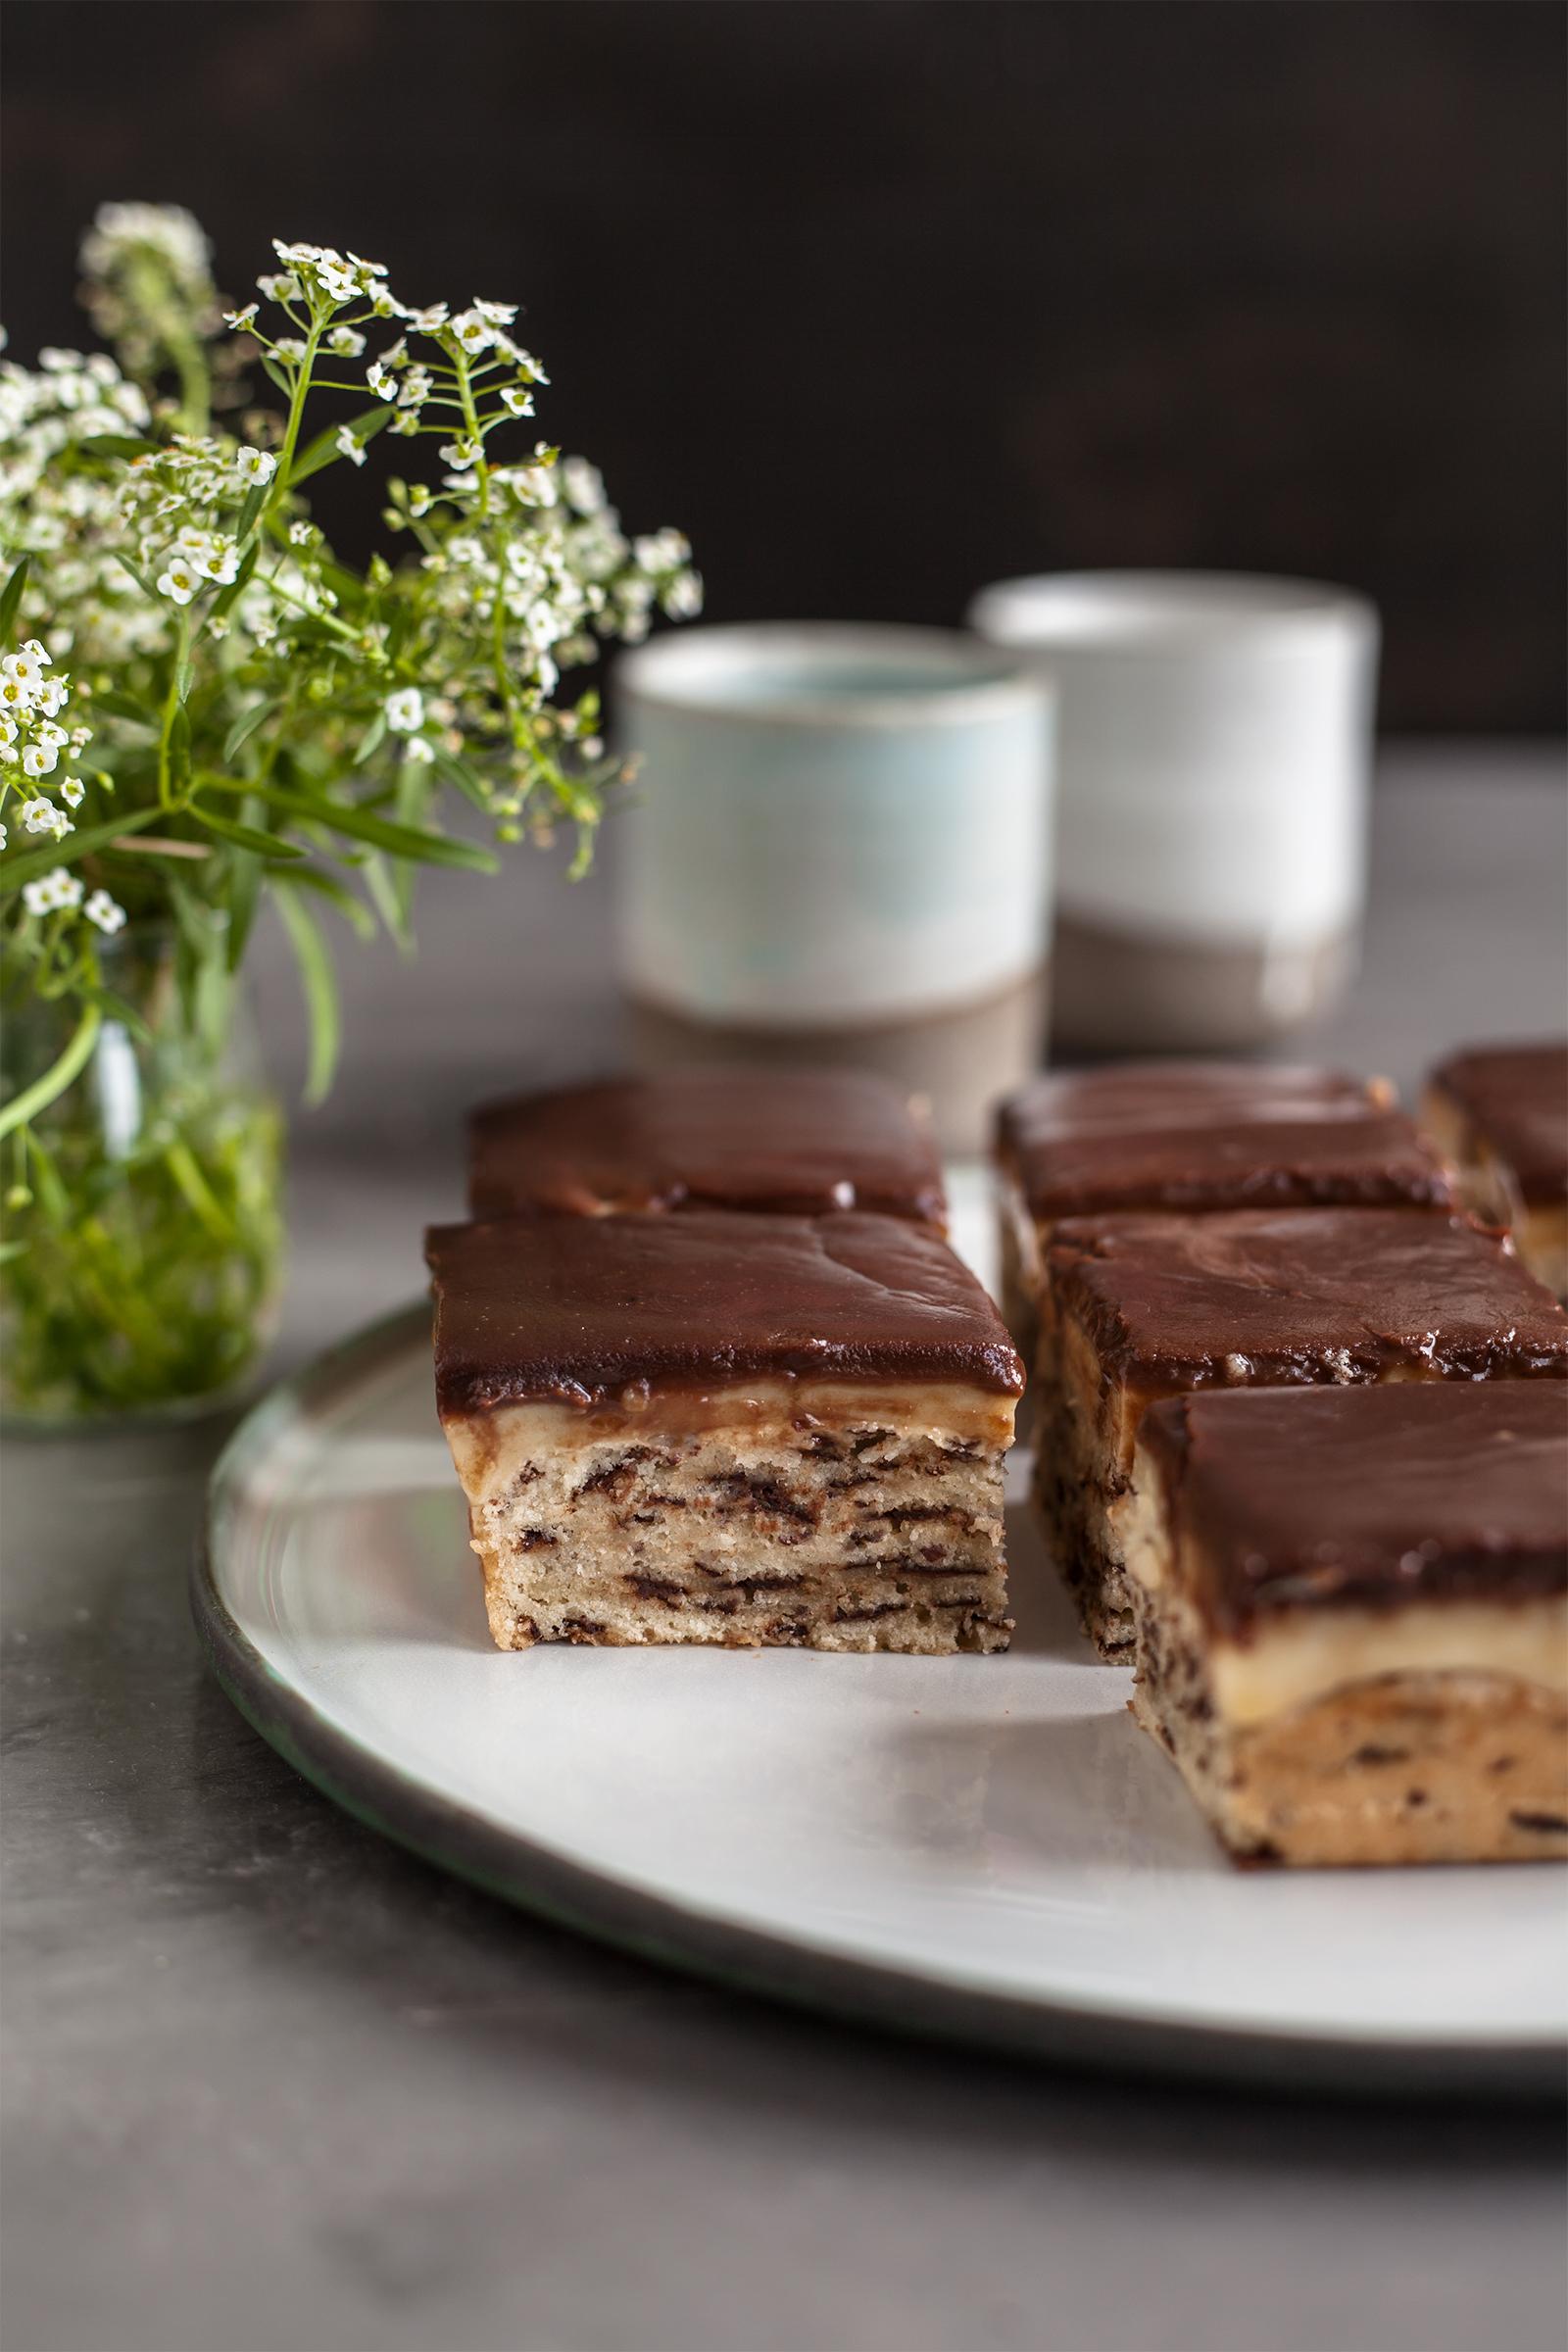 Schoko vanille Kuchen Vegan Rezept